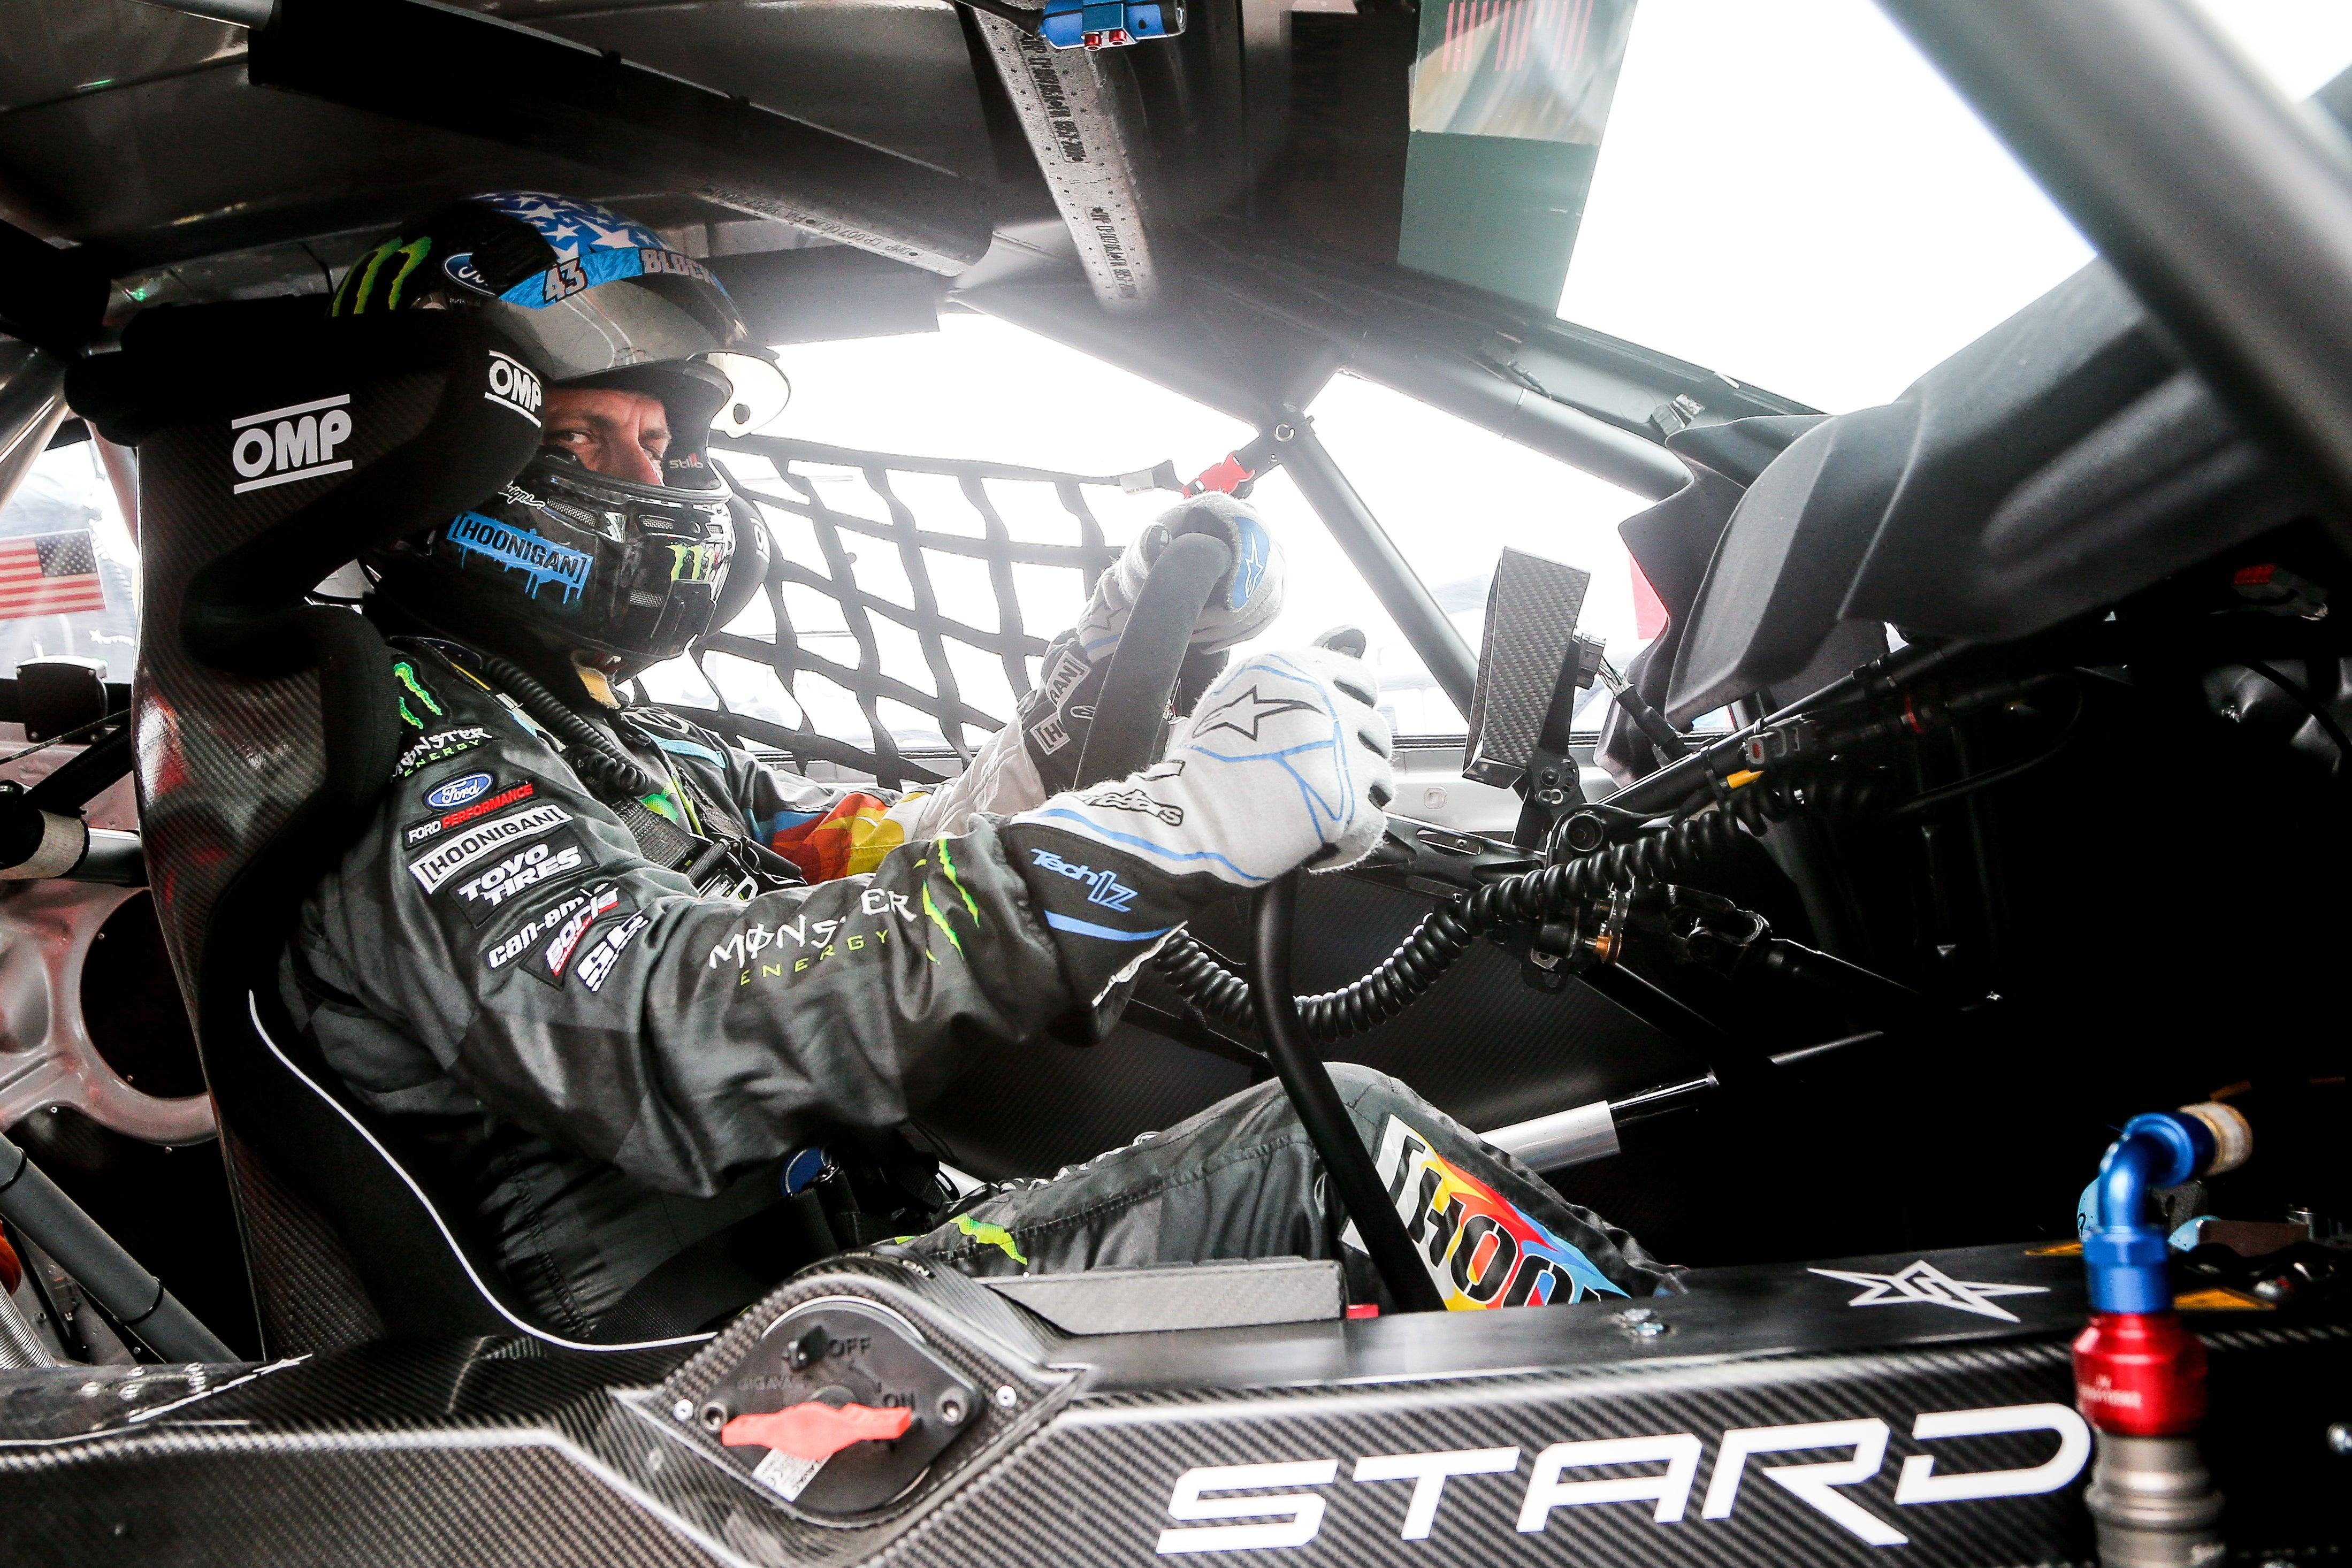 Ken Block Wins First Ever Electric Rallycross Race In 600 Hp Ford Fiesta Erx